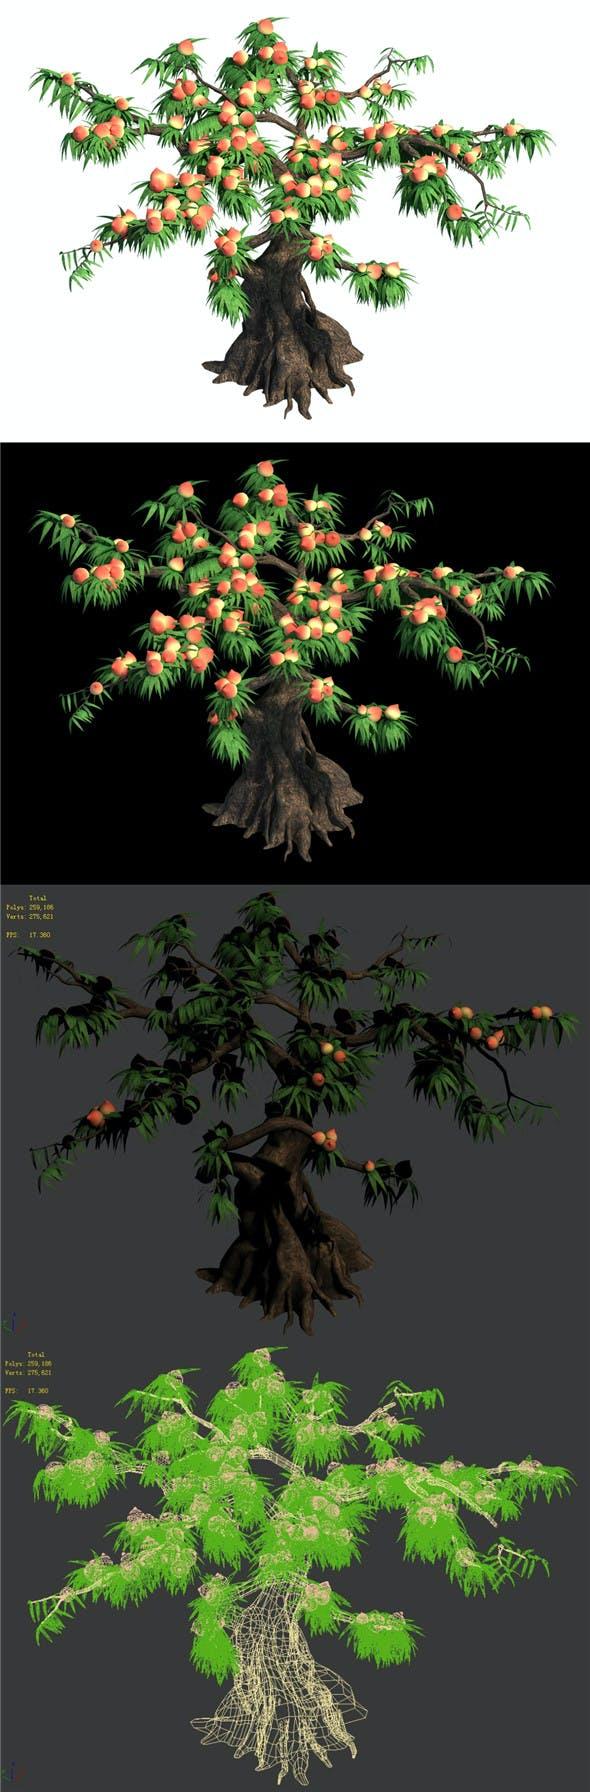 Plant - peach tree 032 - 3DOcean Item for Sale